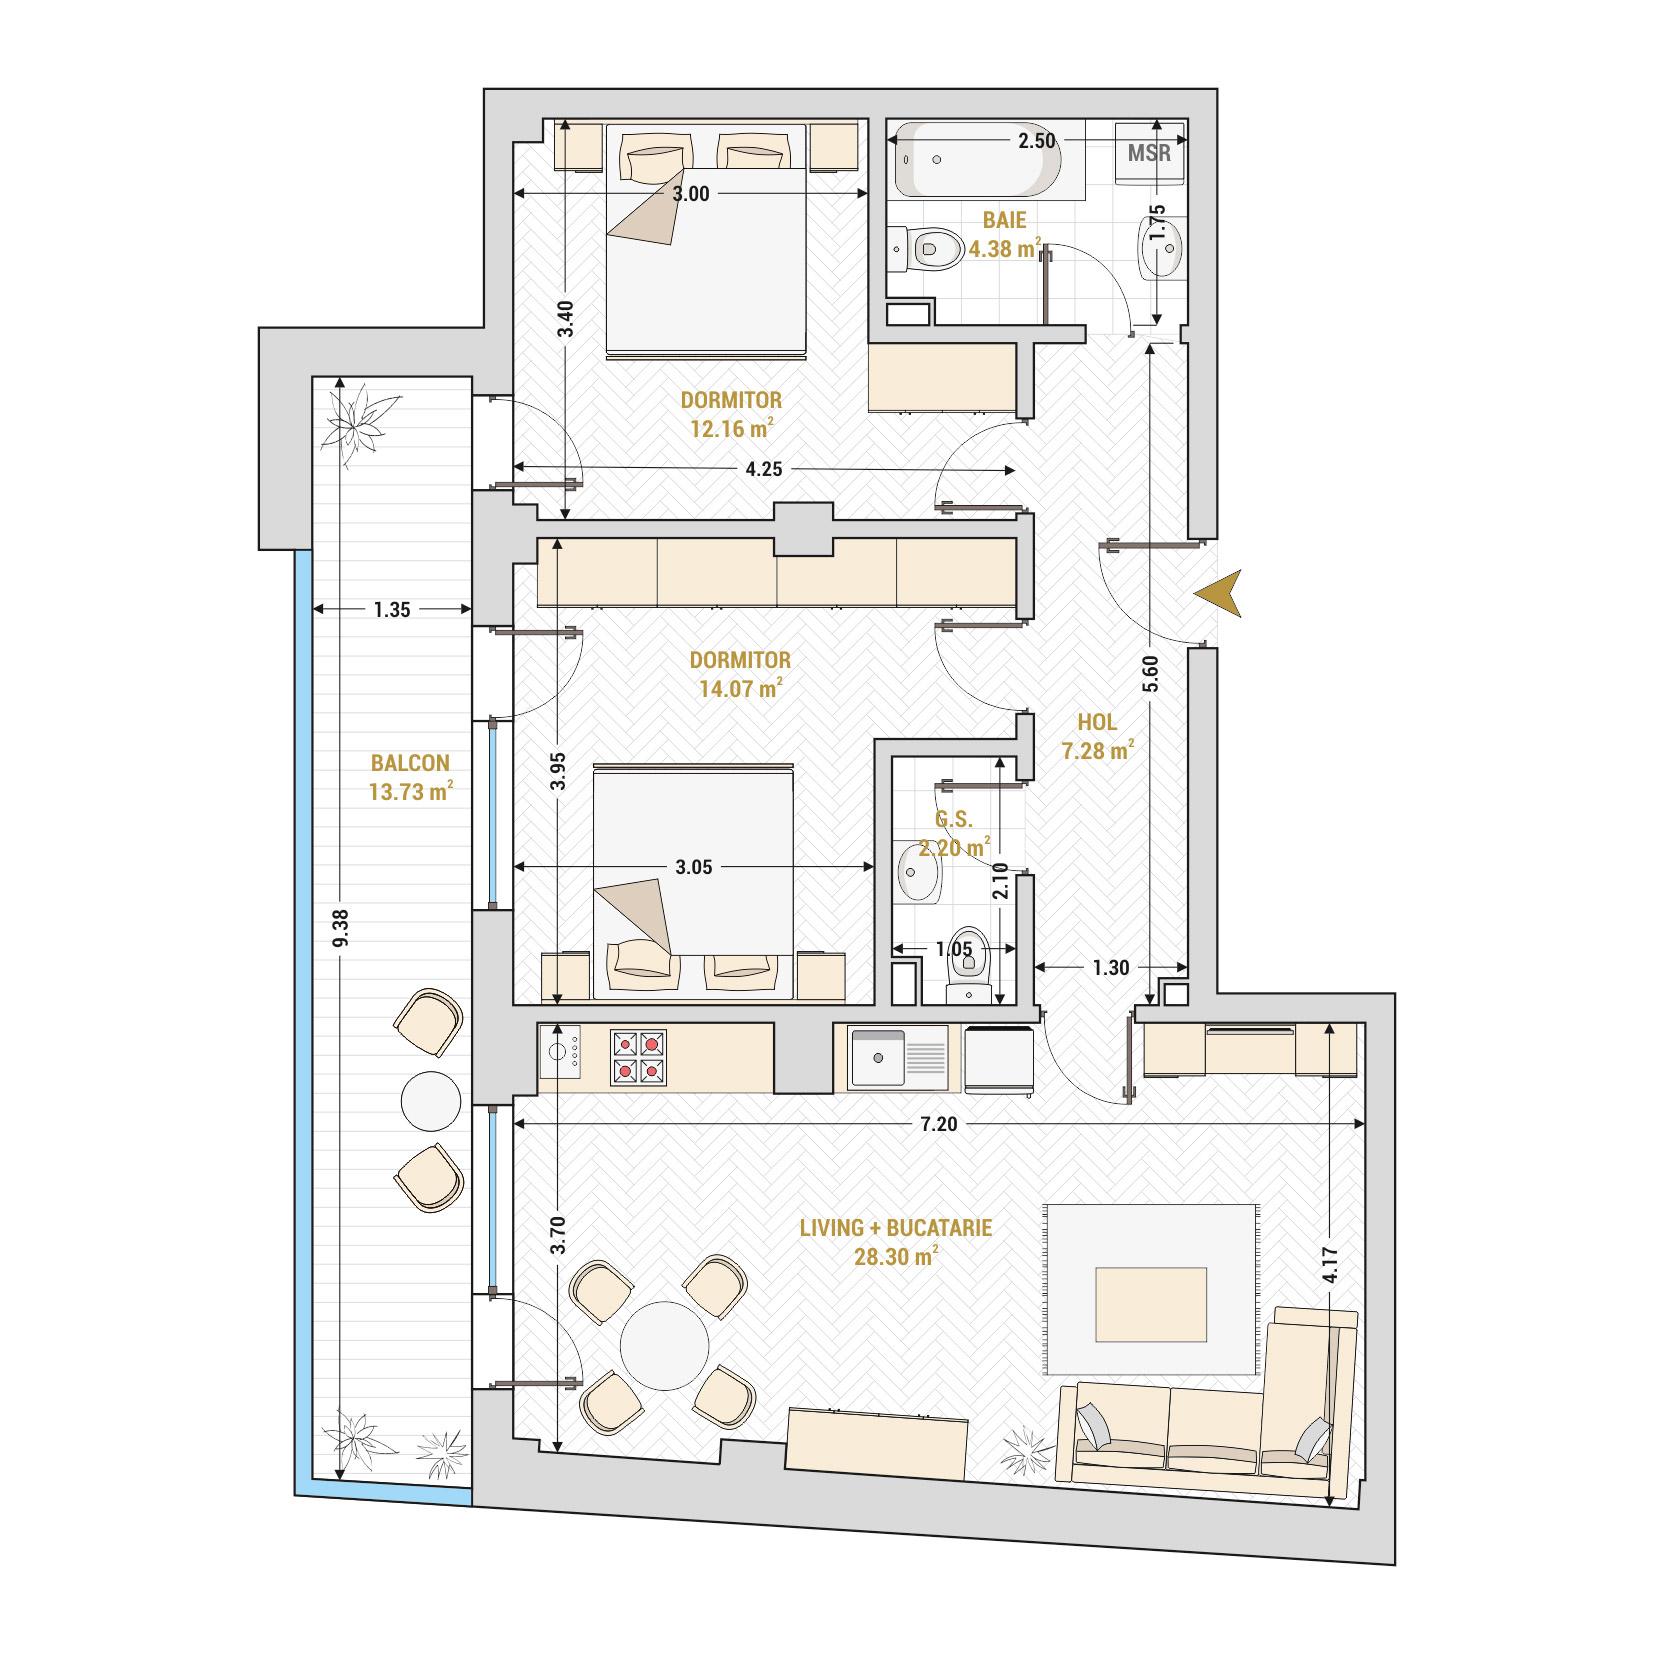 Apartament 3 camere de vanzare Bucuresti - Catedral Residence - Marriott, Piata Unirii, 13 Septembrie, Izvor - Tip 4 - T2A